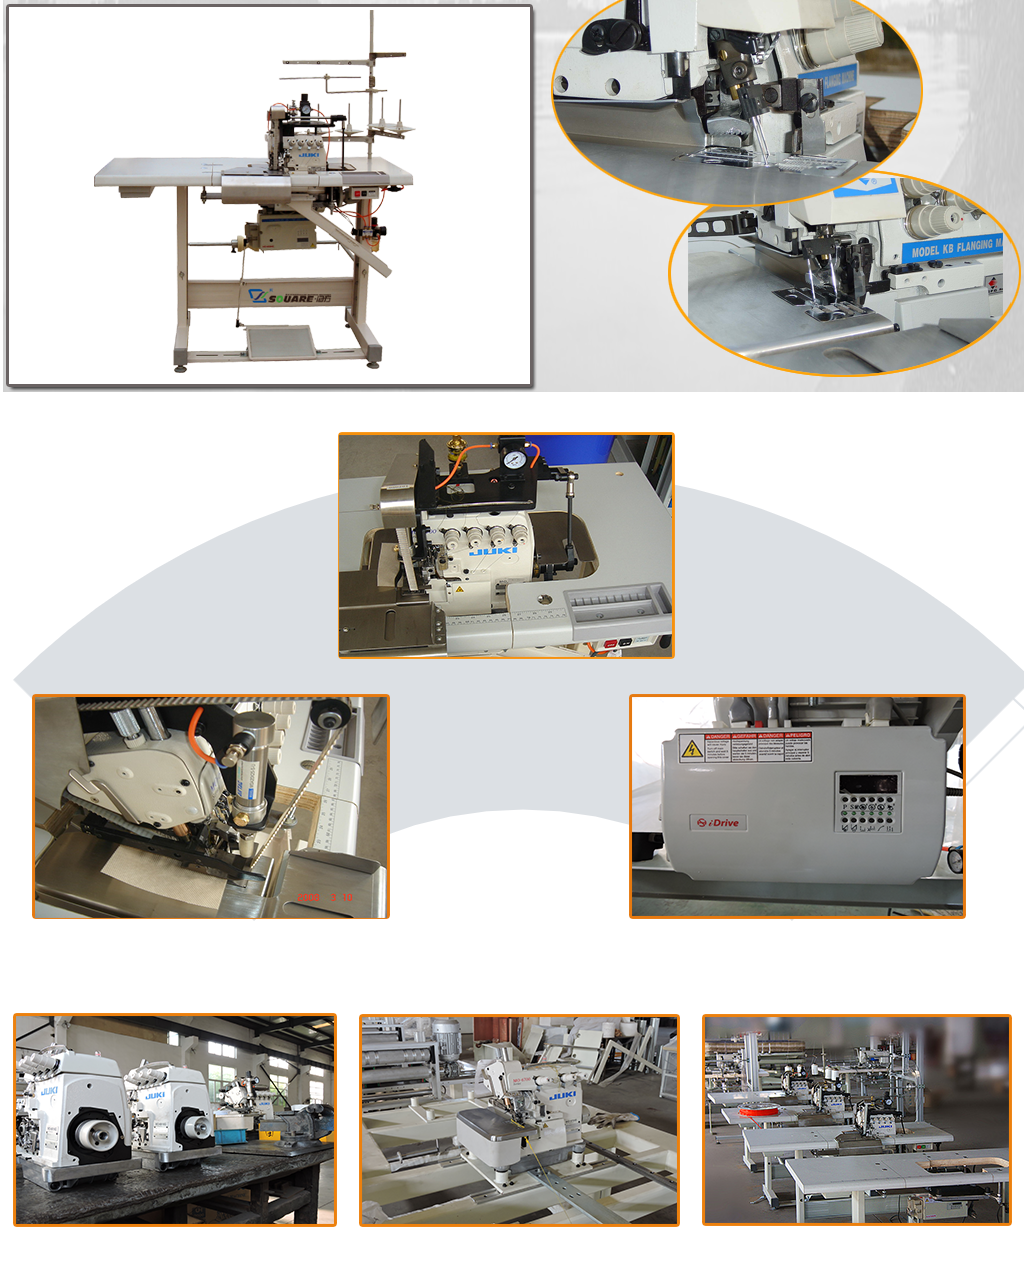 KB3 multifunction flanging machine details